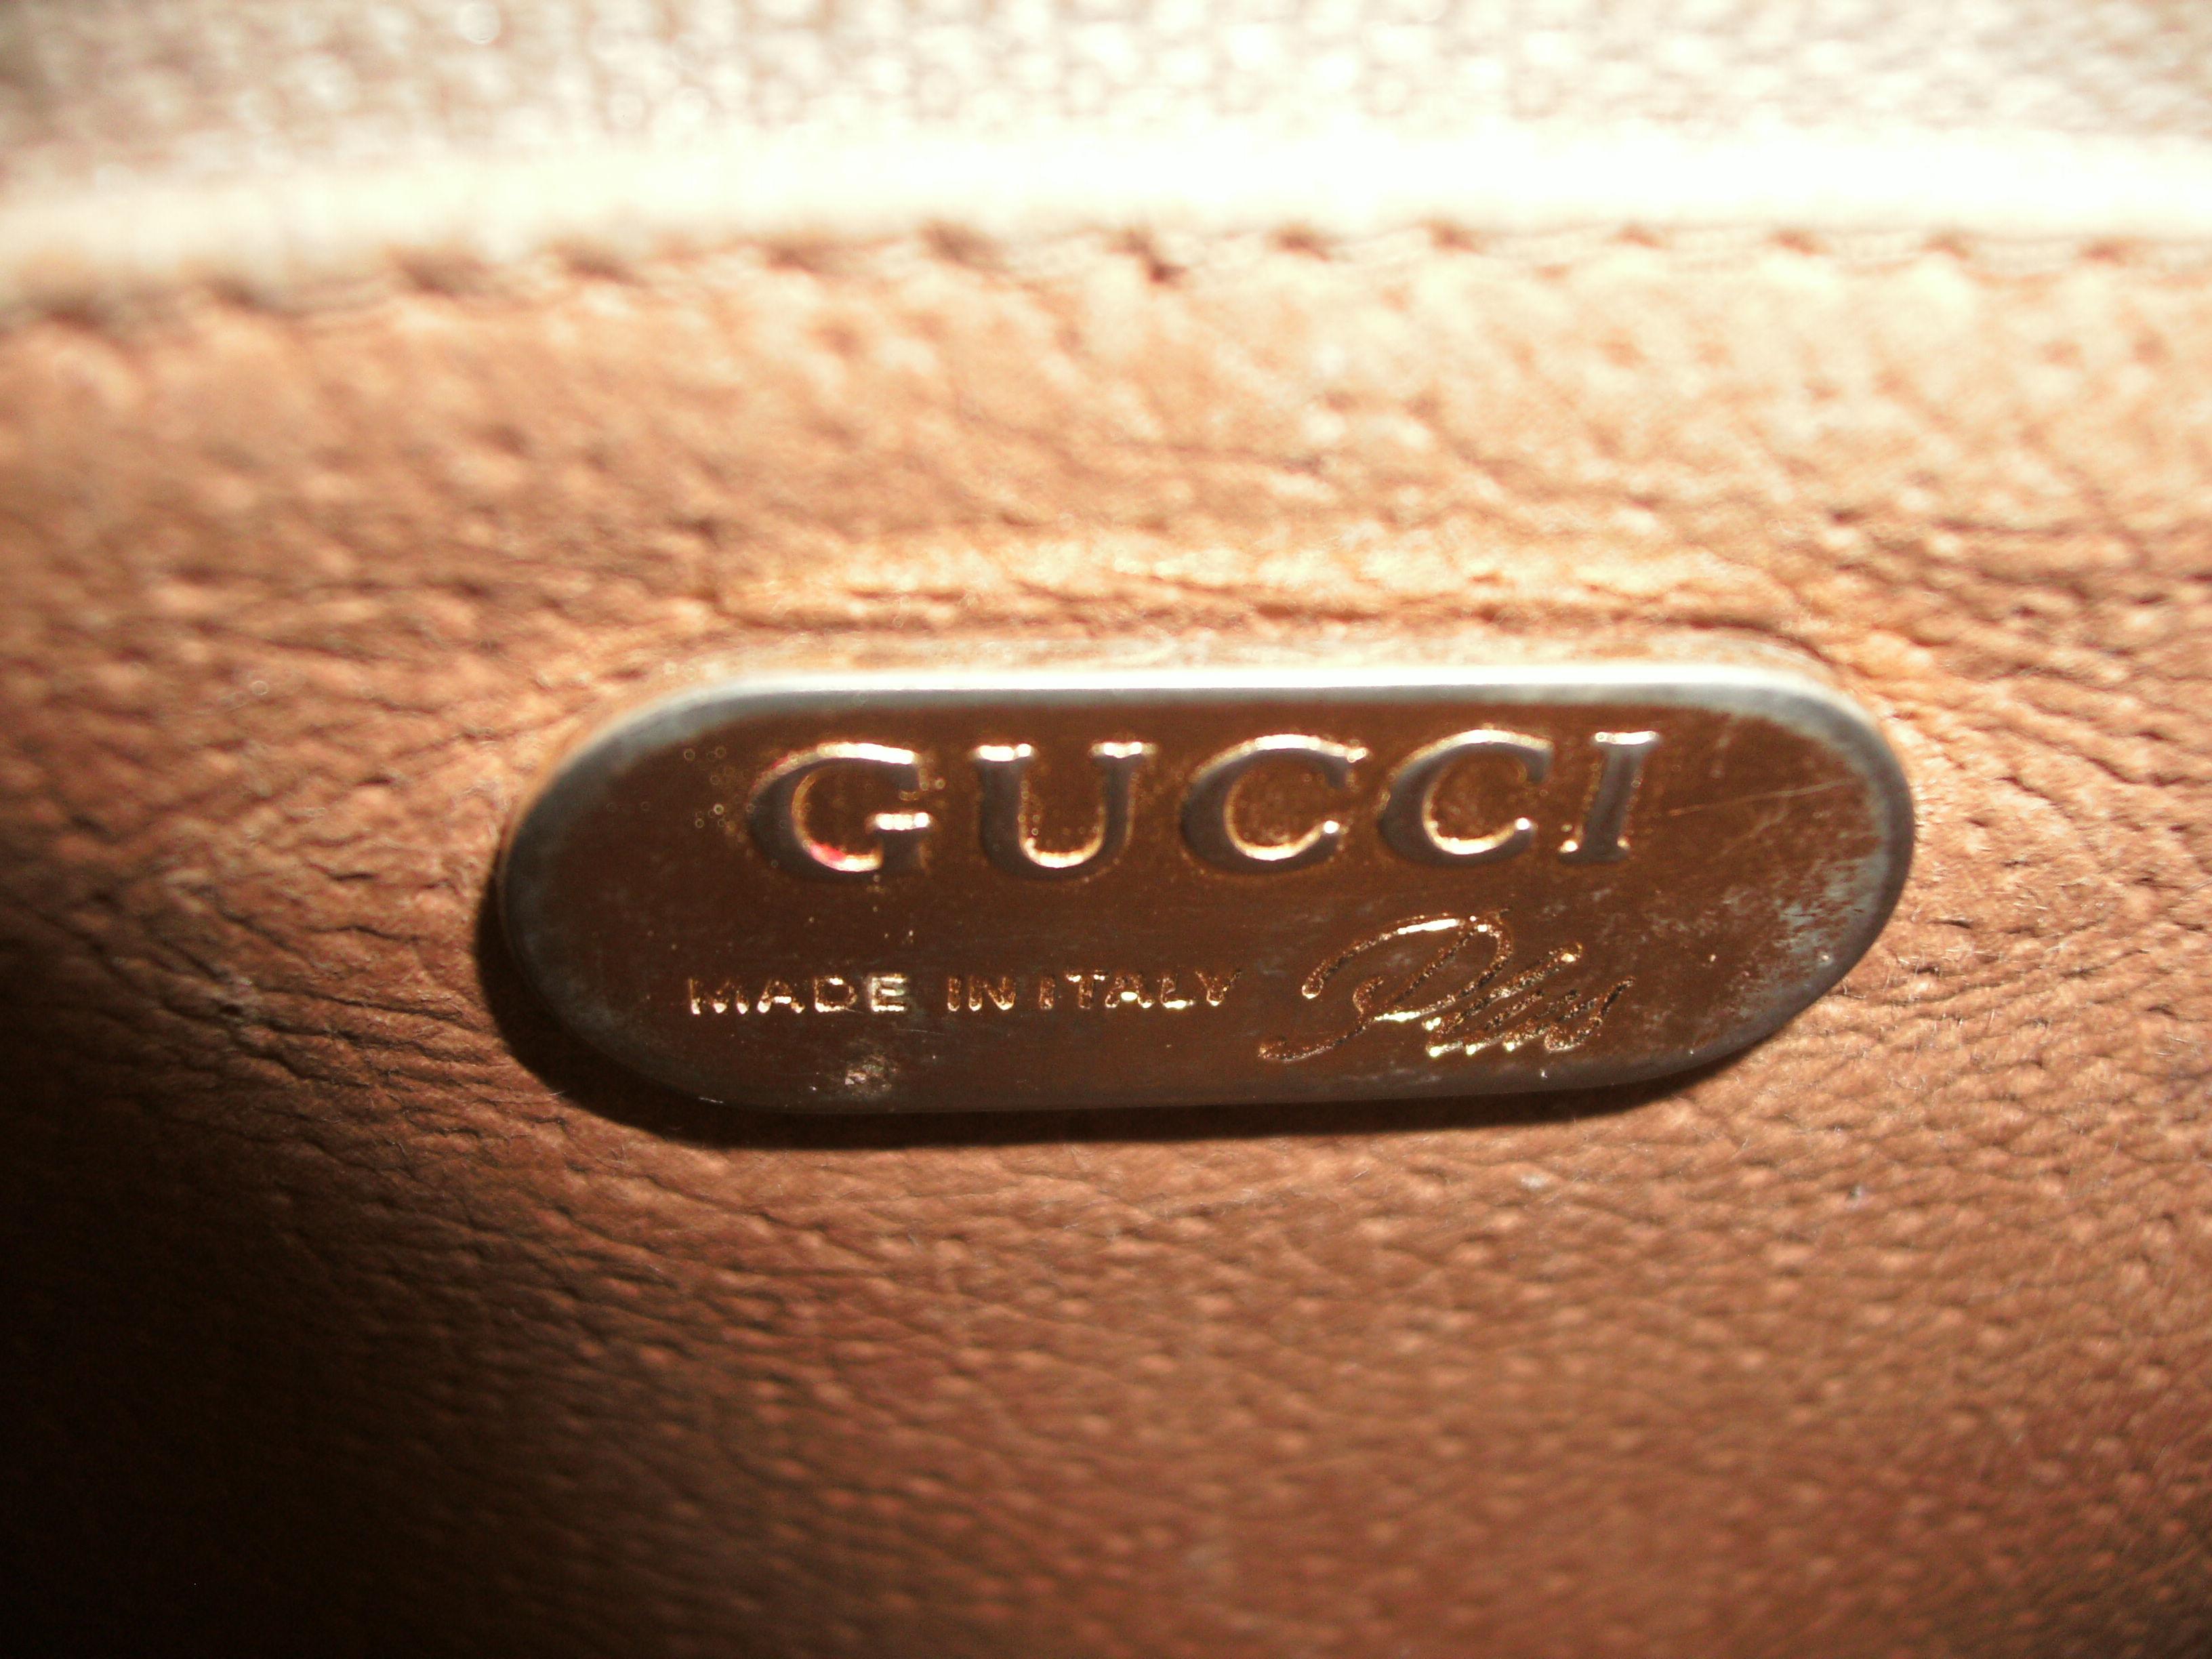 19edd586b12 Vintage Gucci Plus Bag - The eBay Community